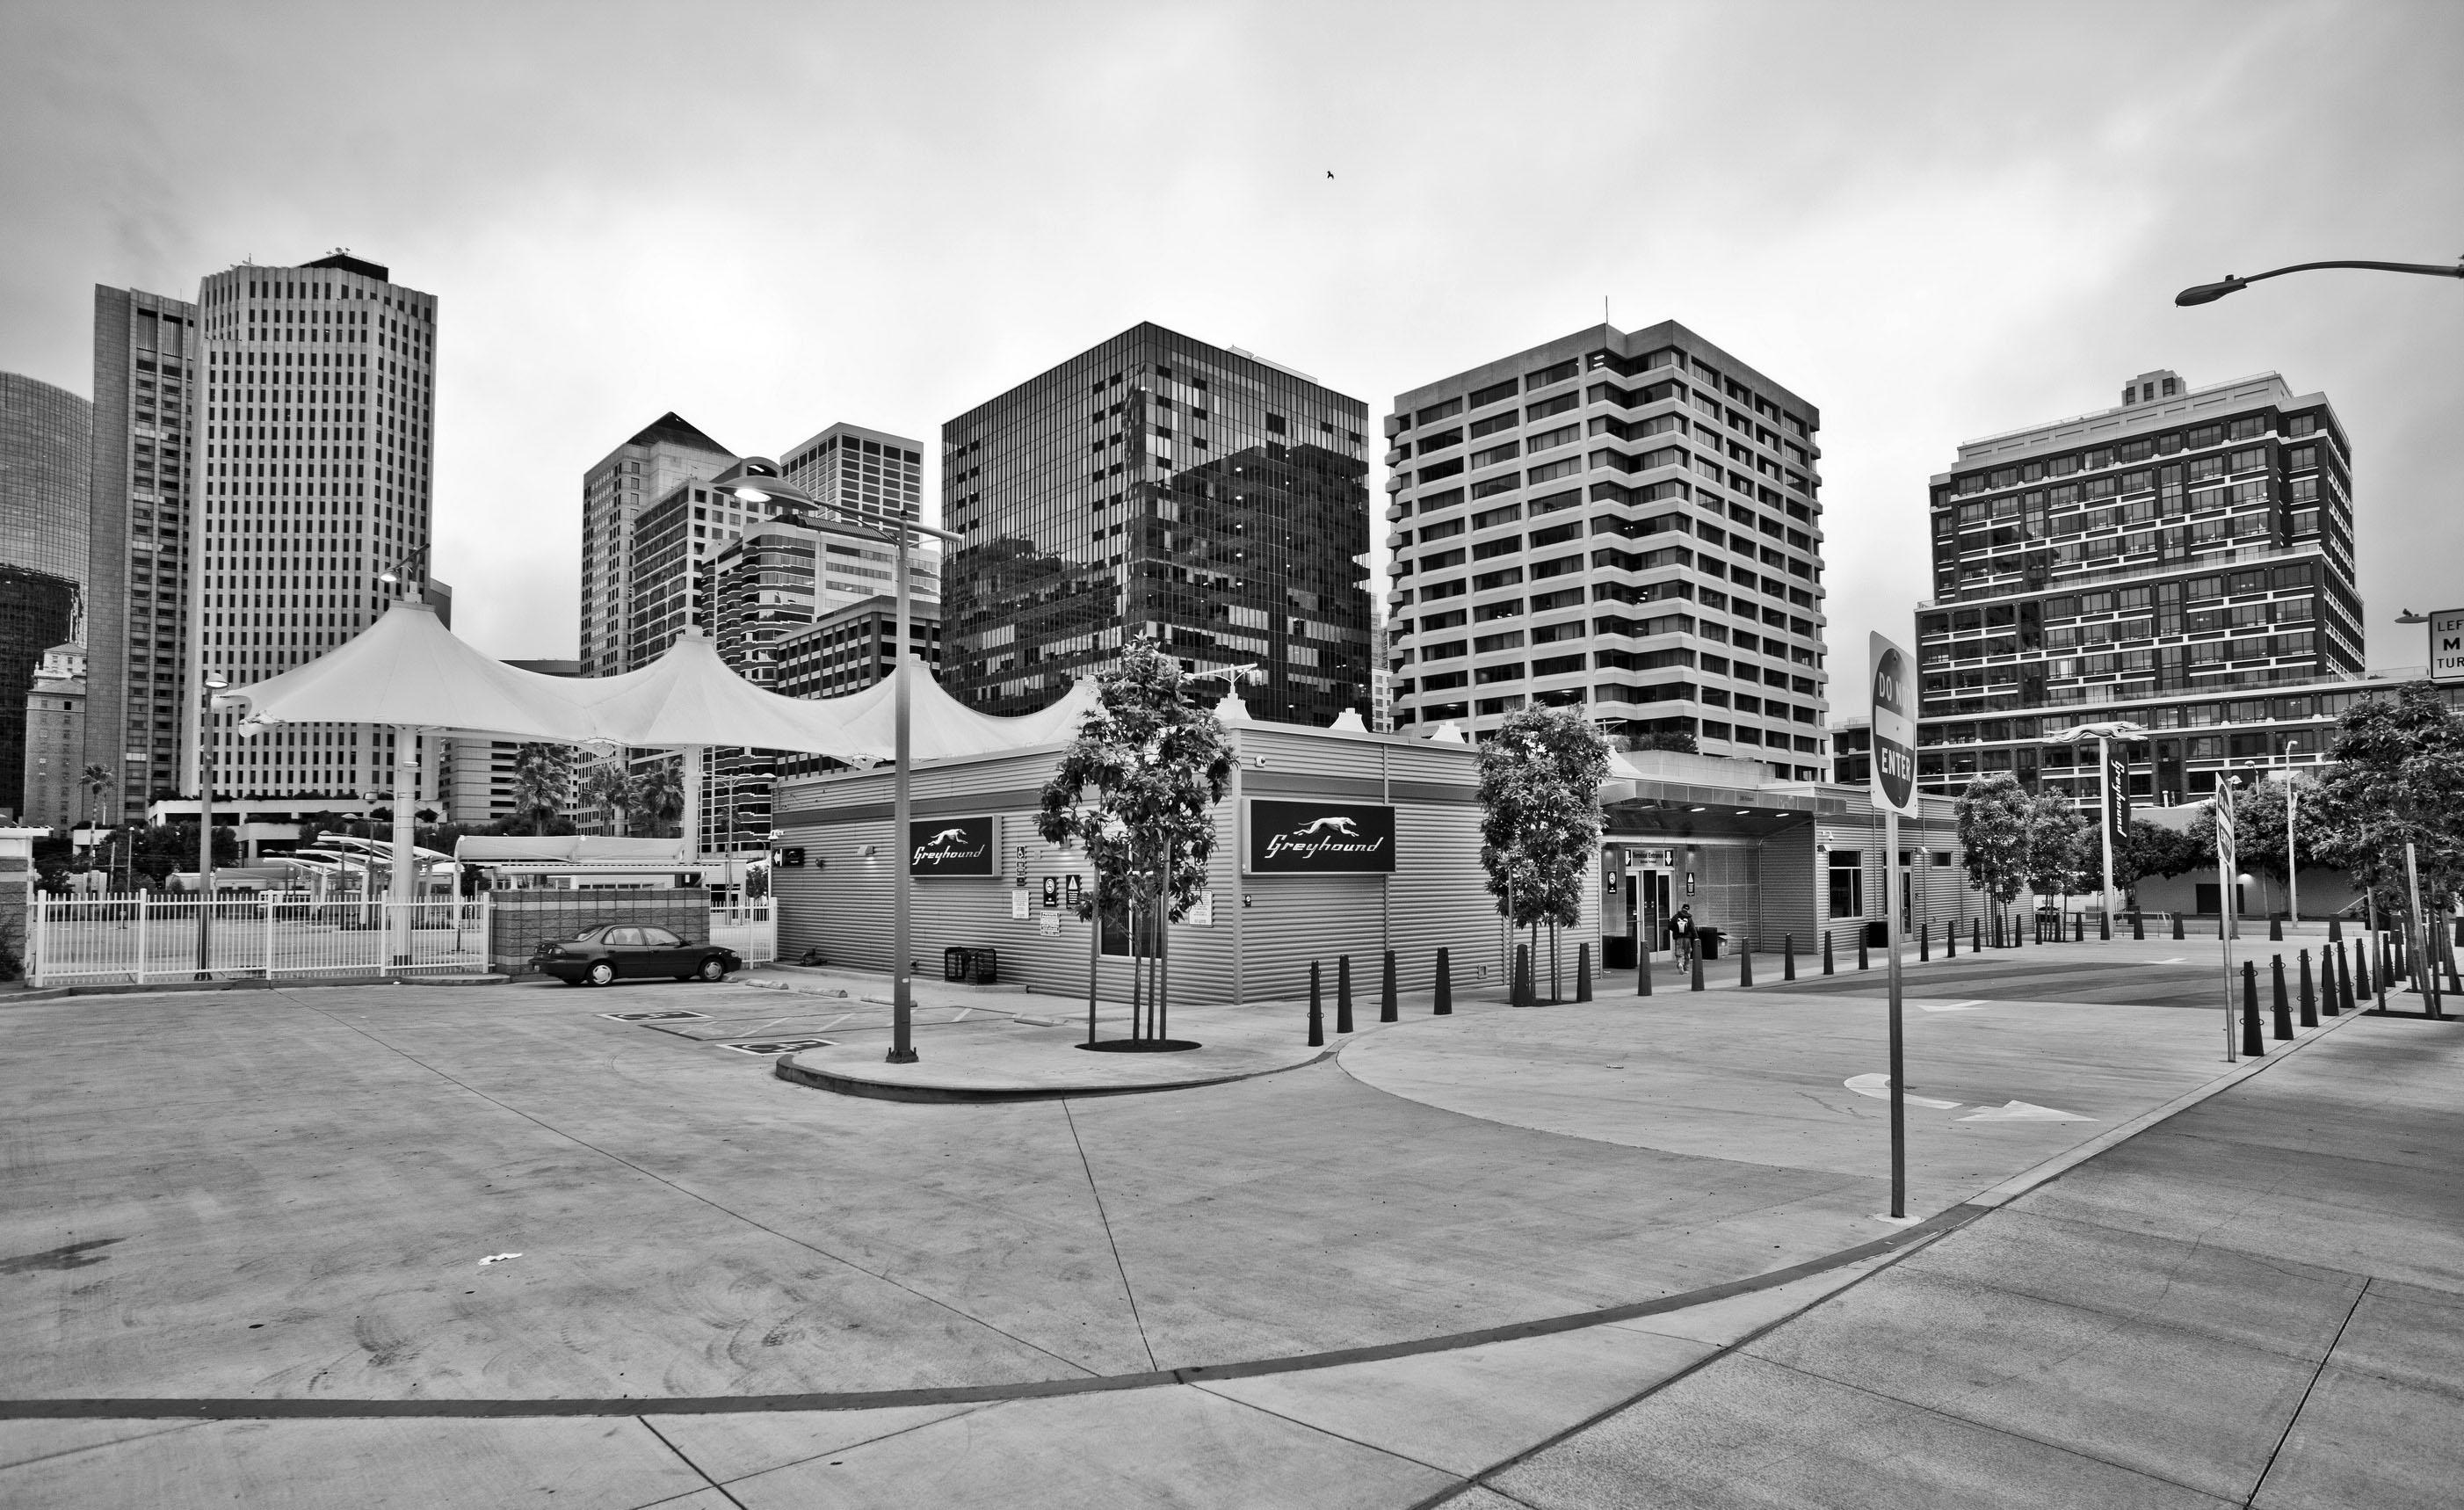 Architecture Grayhound Terminal along Folsom St San Francisco CA July 2011 03